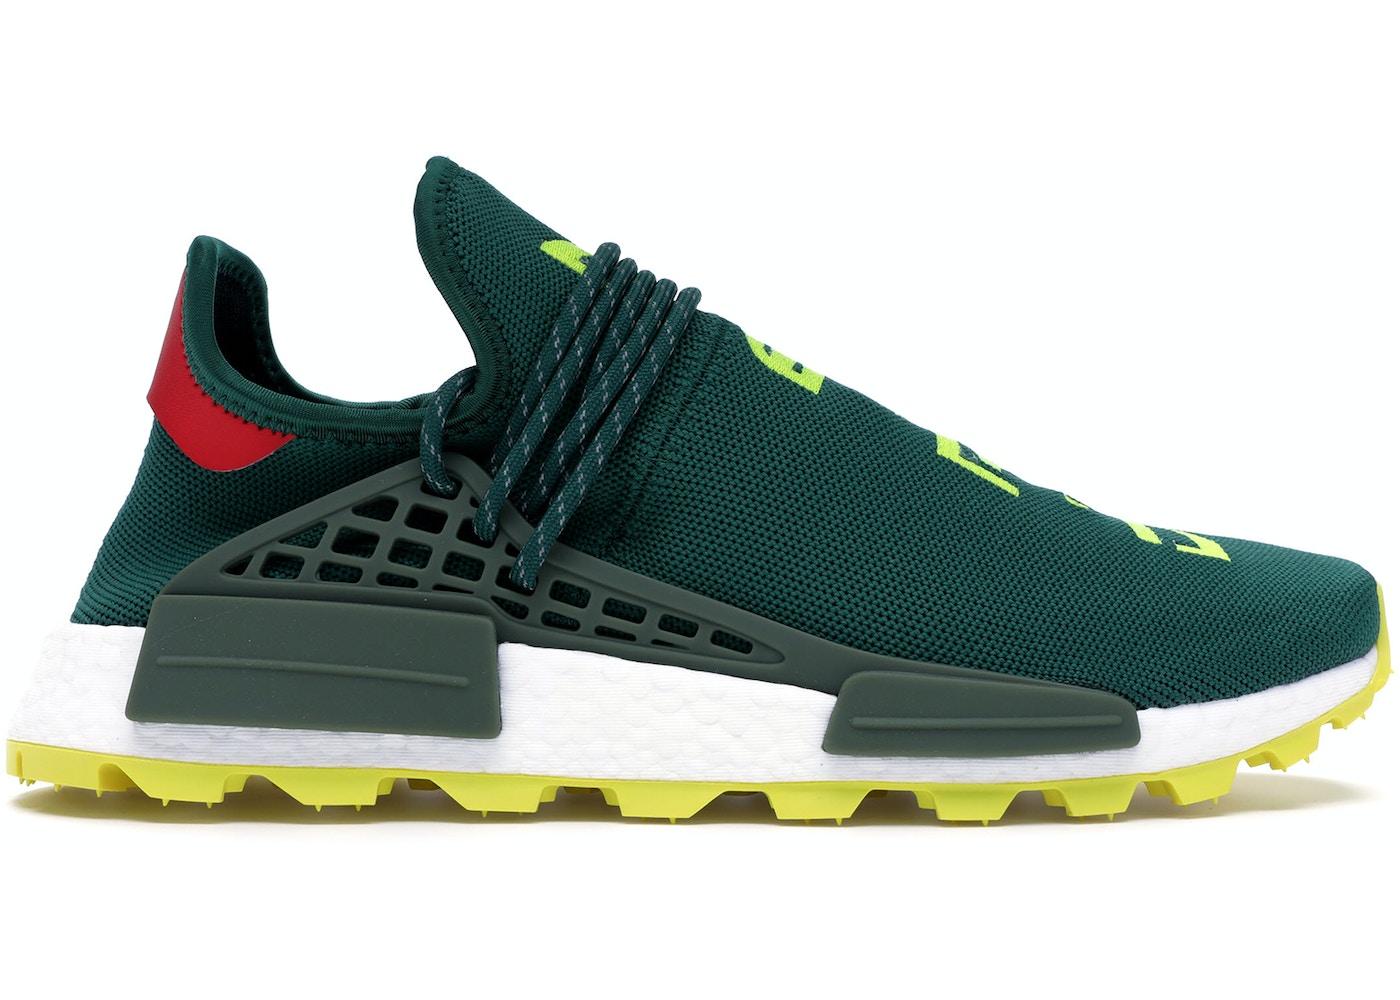 new style 3d12f 9d9ea adidas NMD Hu Pharrell NERD Green Yellow